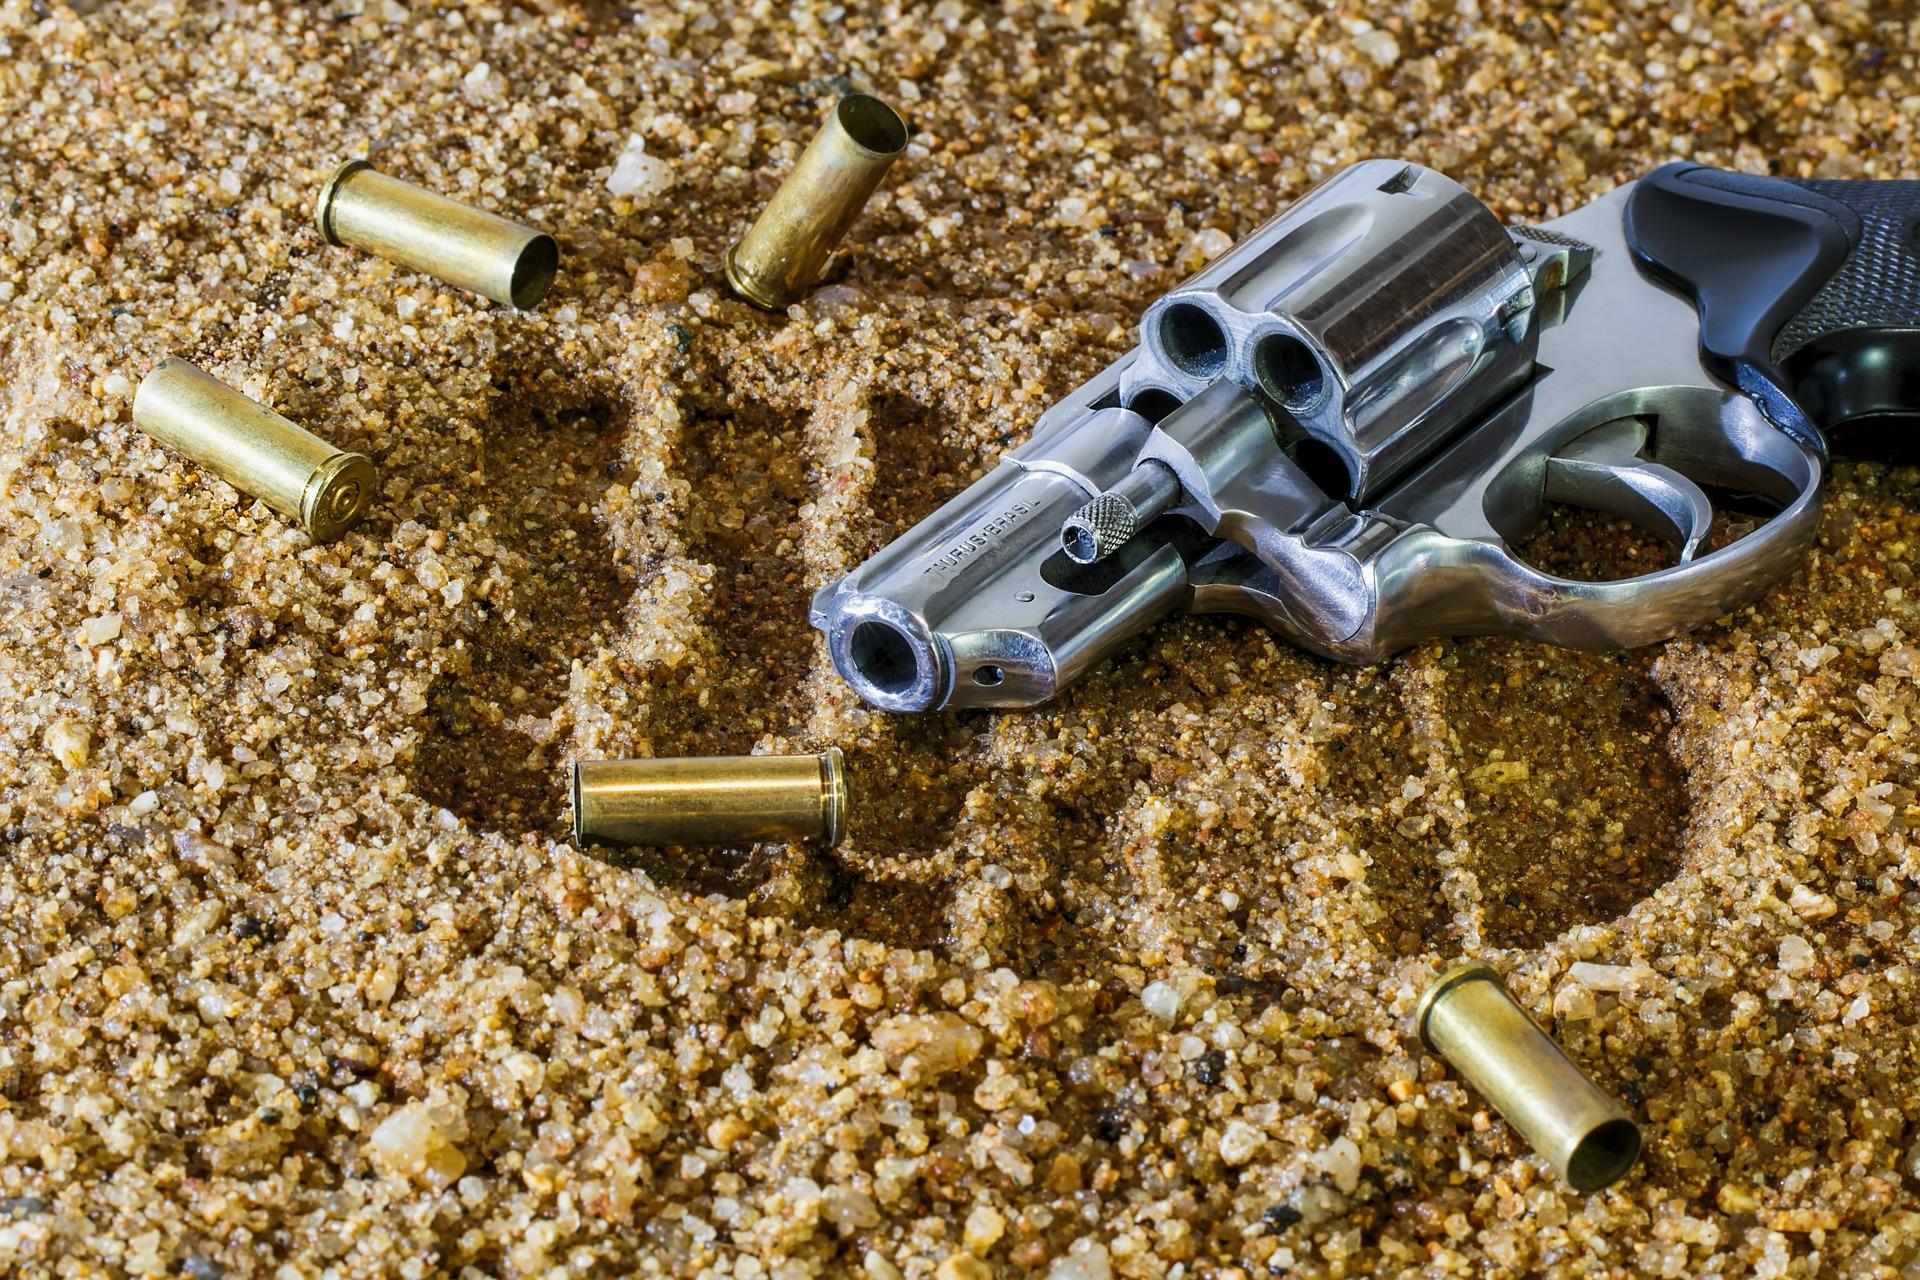 Arma de fogo; violência; homicídio. Foto: Pixabay